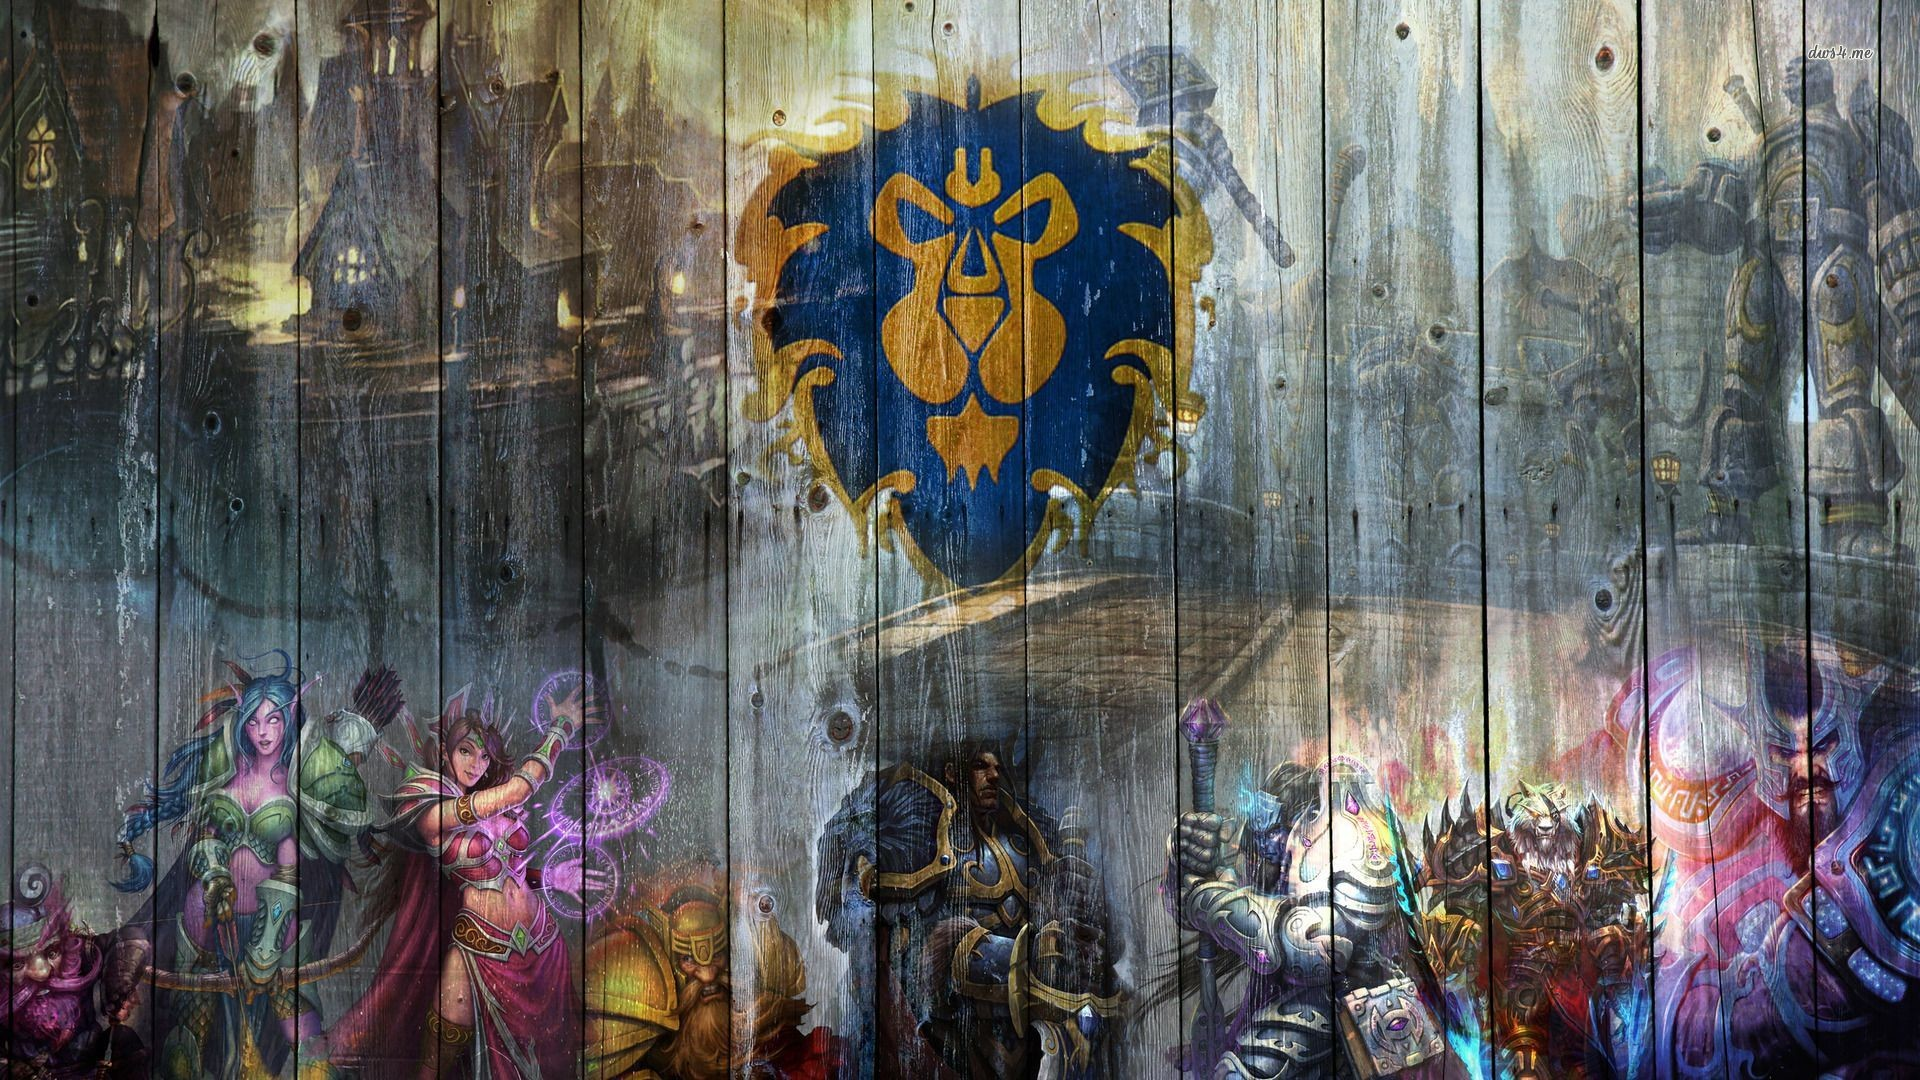 Horde Wallpaper Hd 68 Images